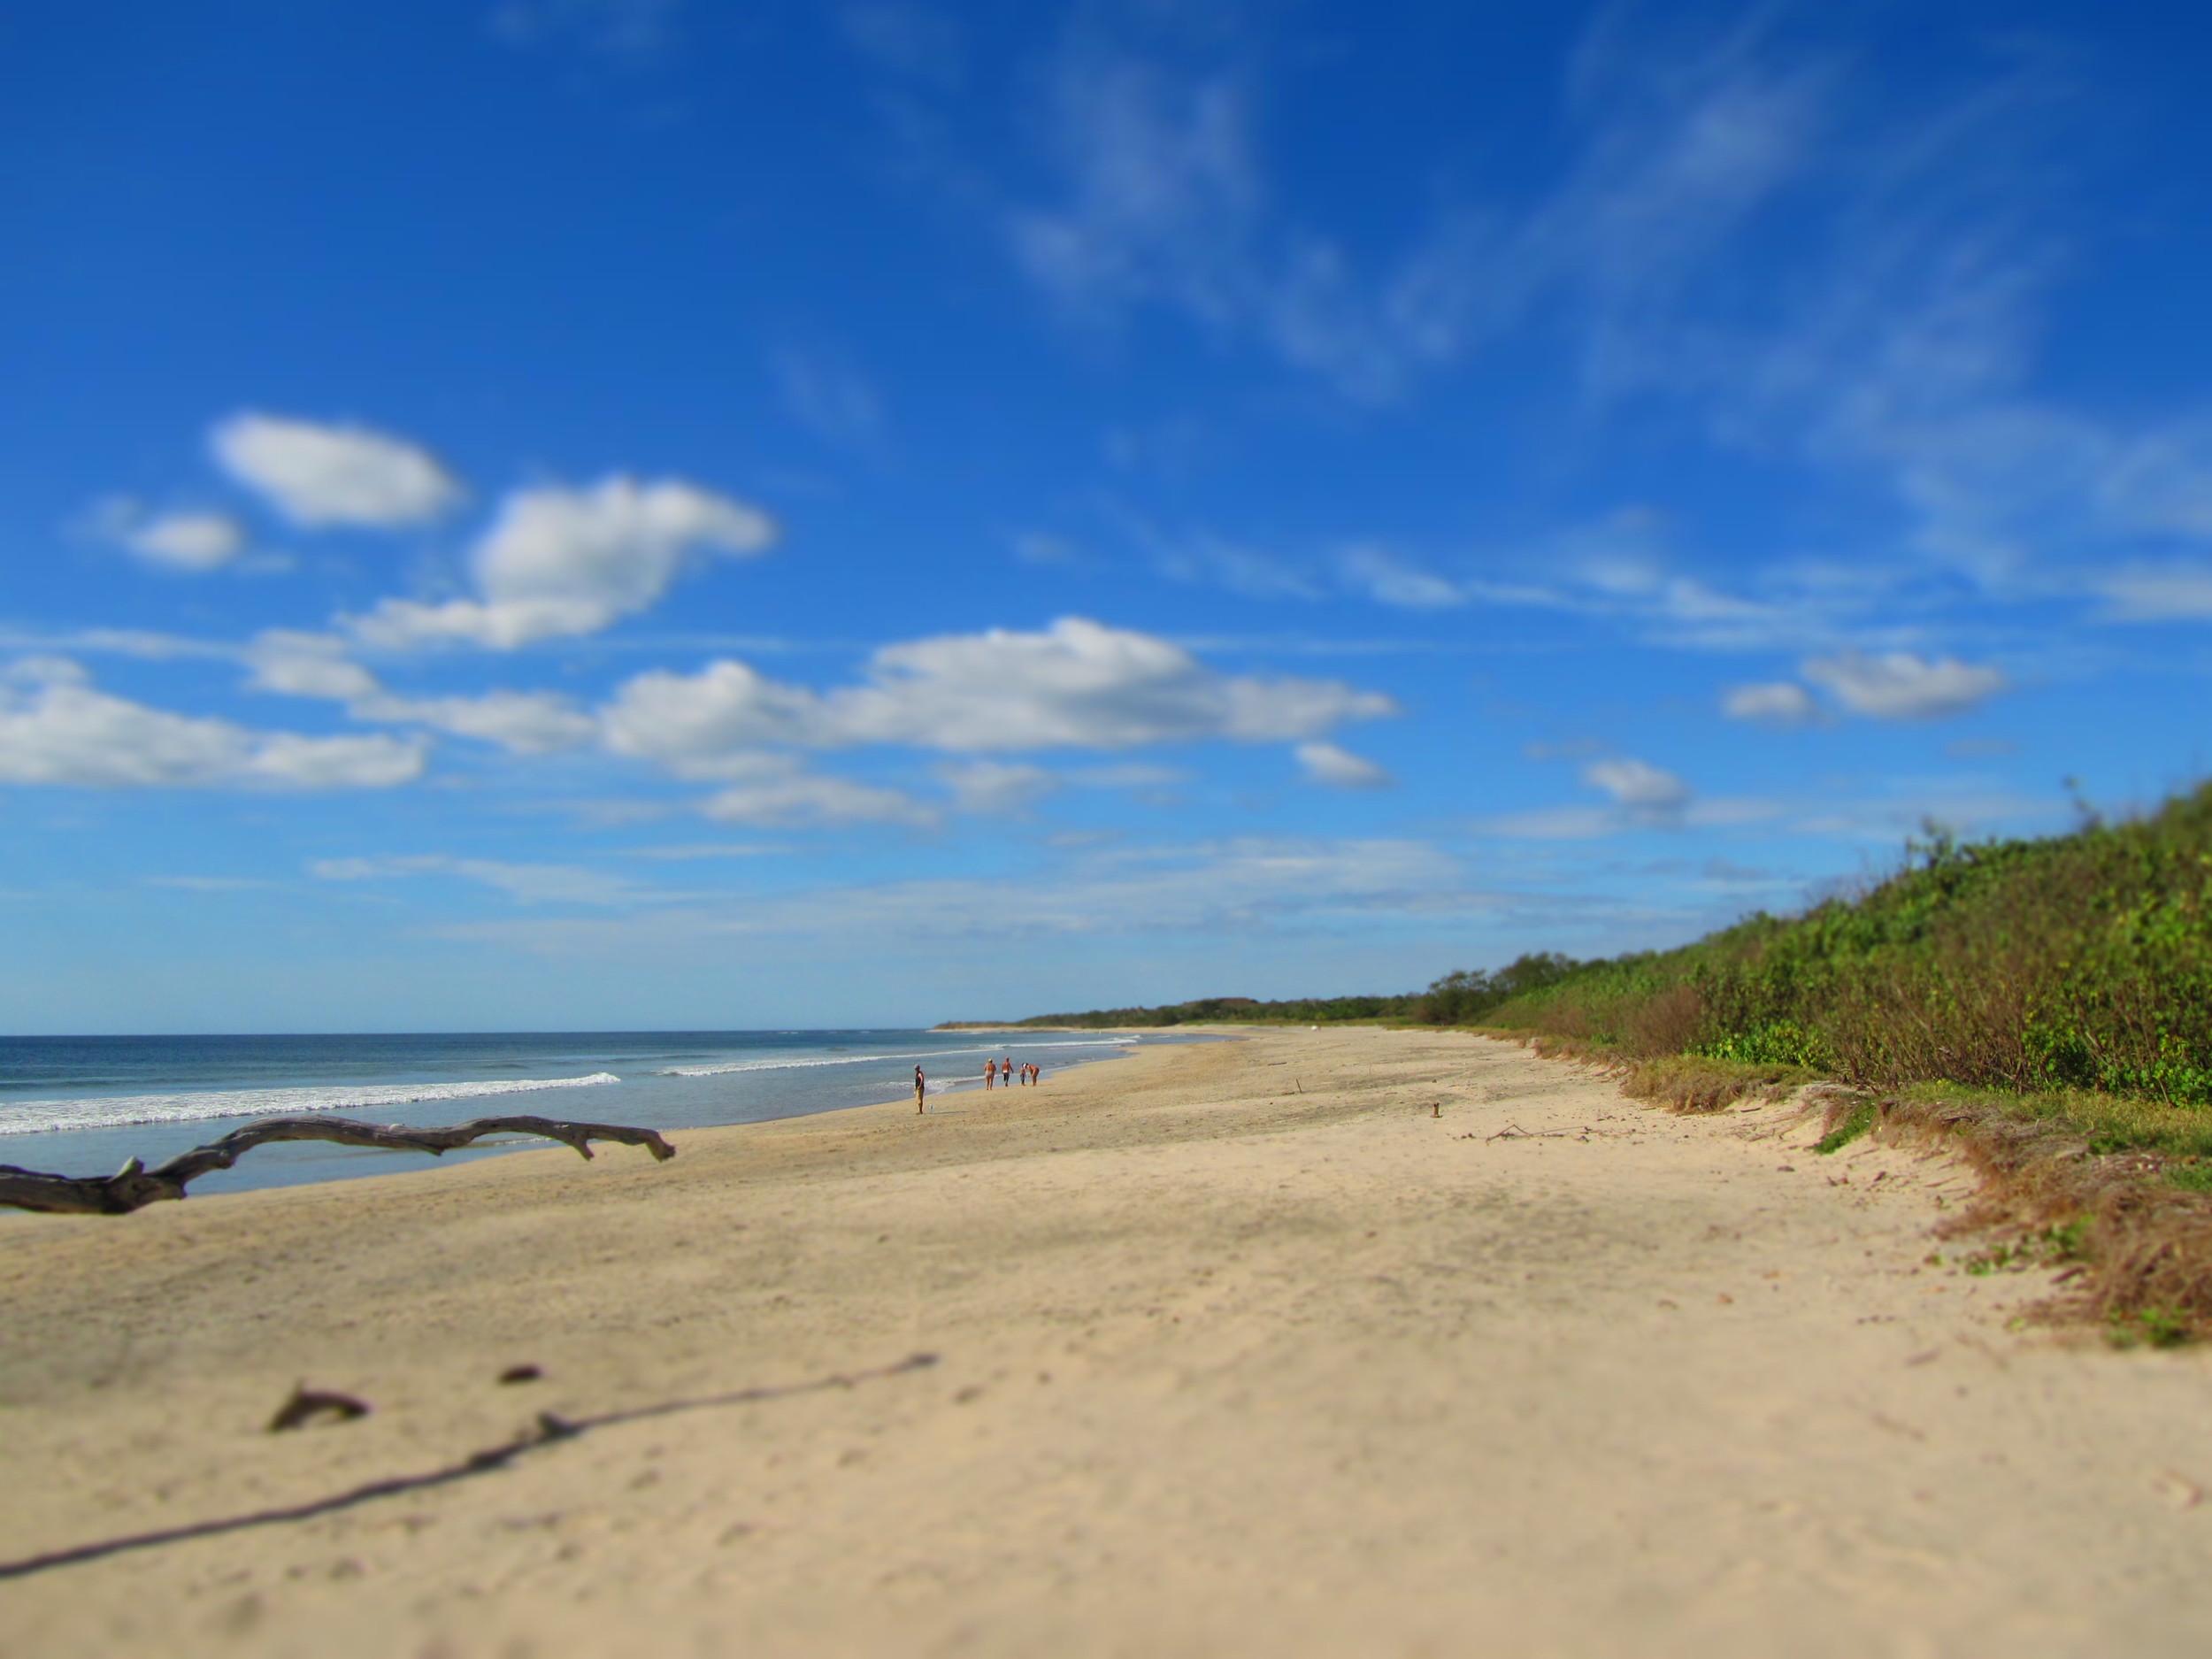 Playa Avellanas, Costa Rica